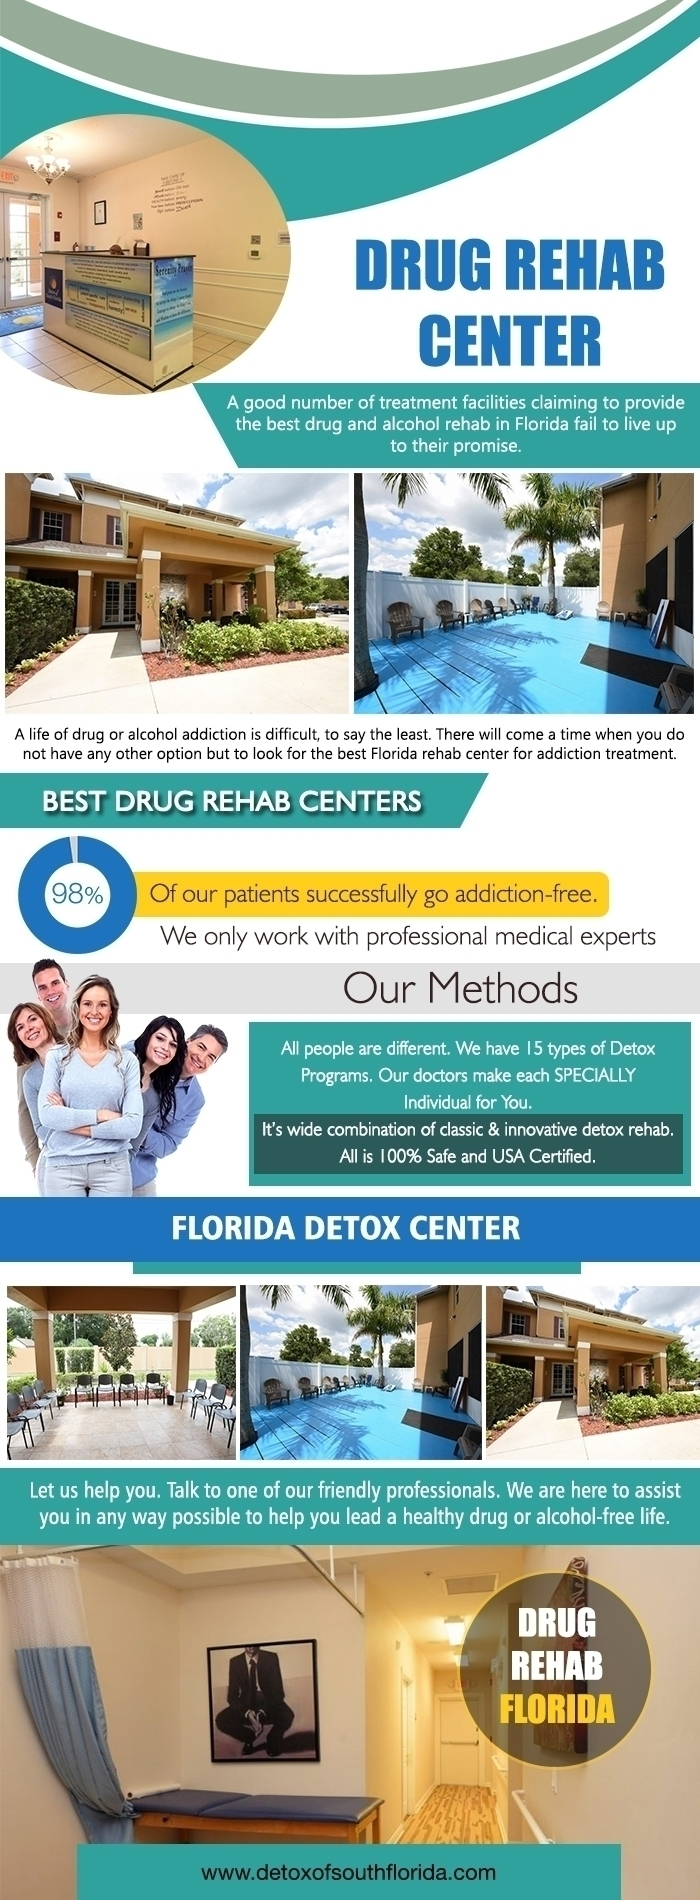 detox Florida Website: Seeking  - detoxofsouthflorid | ello